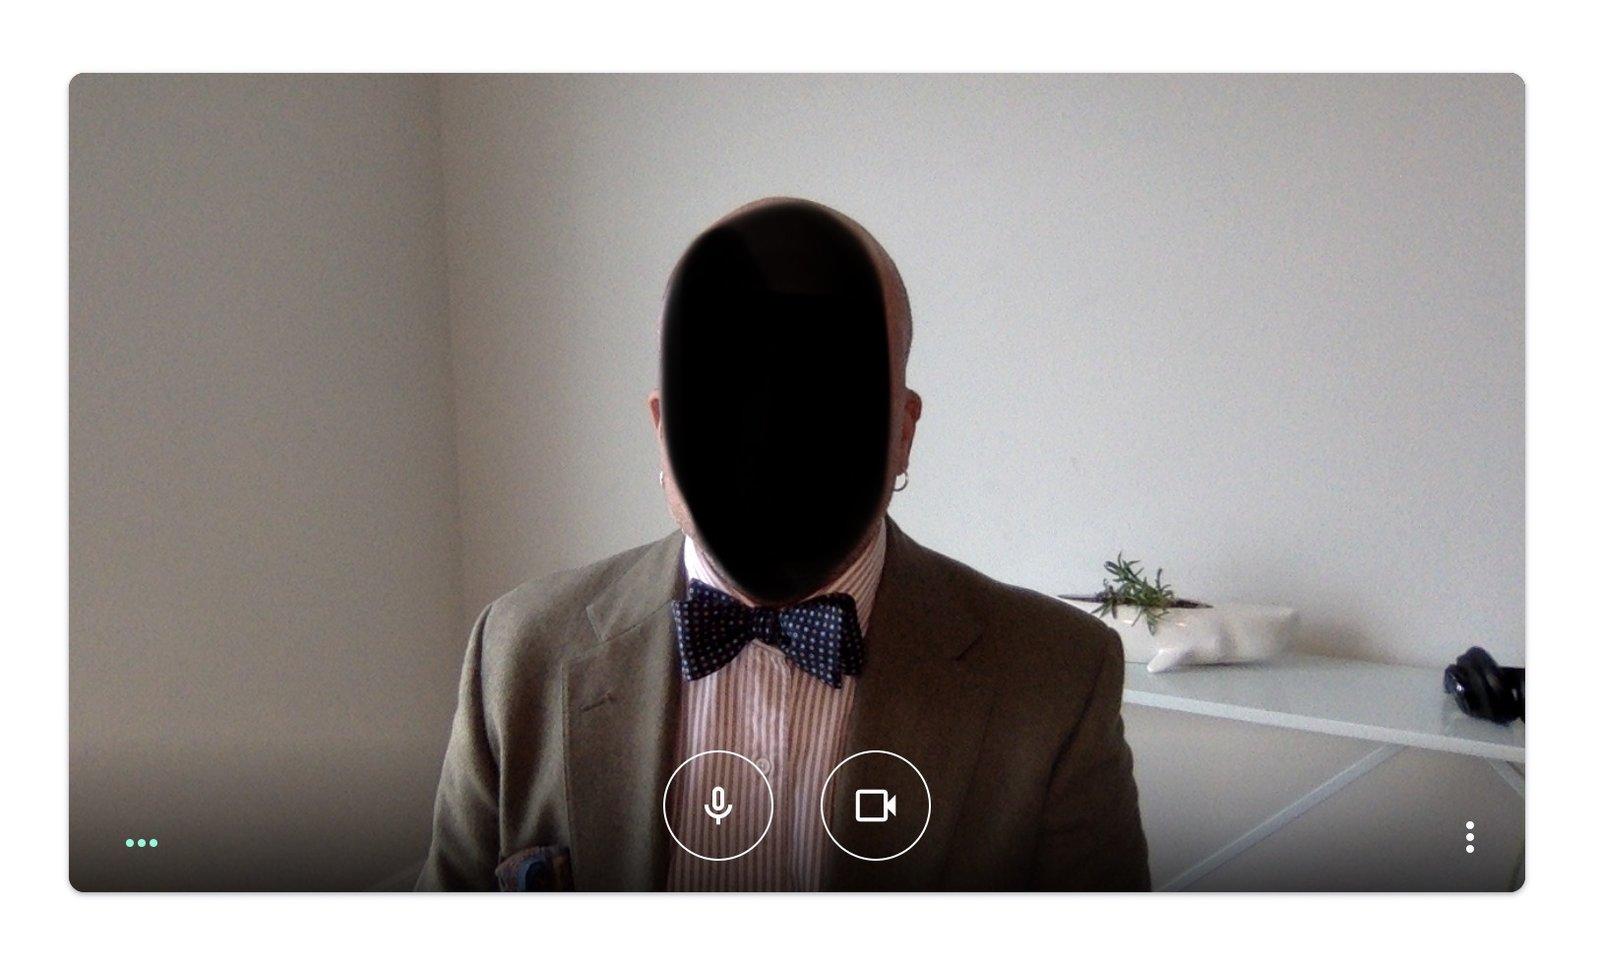 Screen Shot 2020-03-24 at 10.57.41 AM.JPG